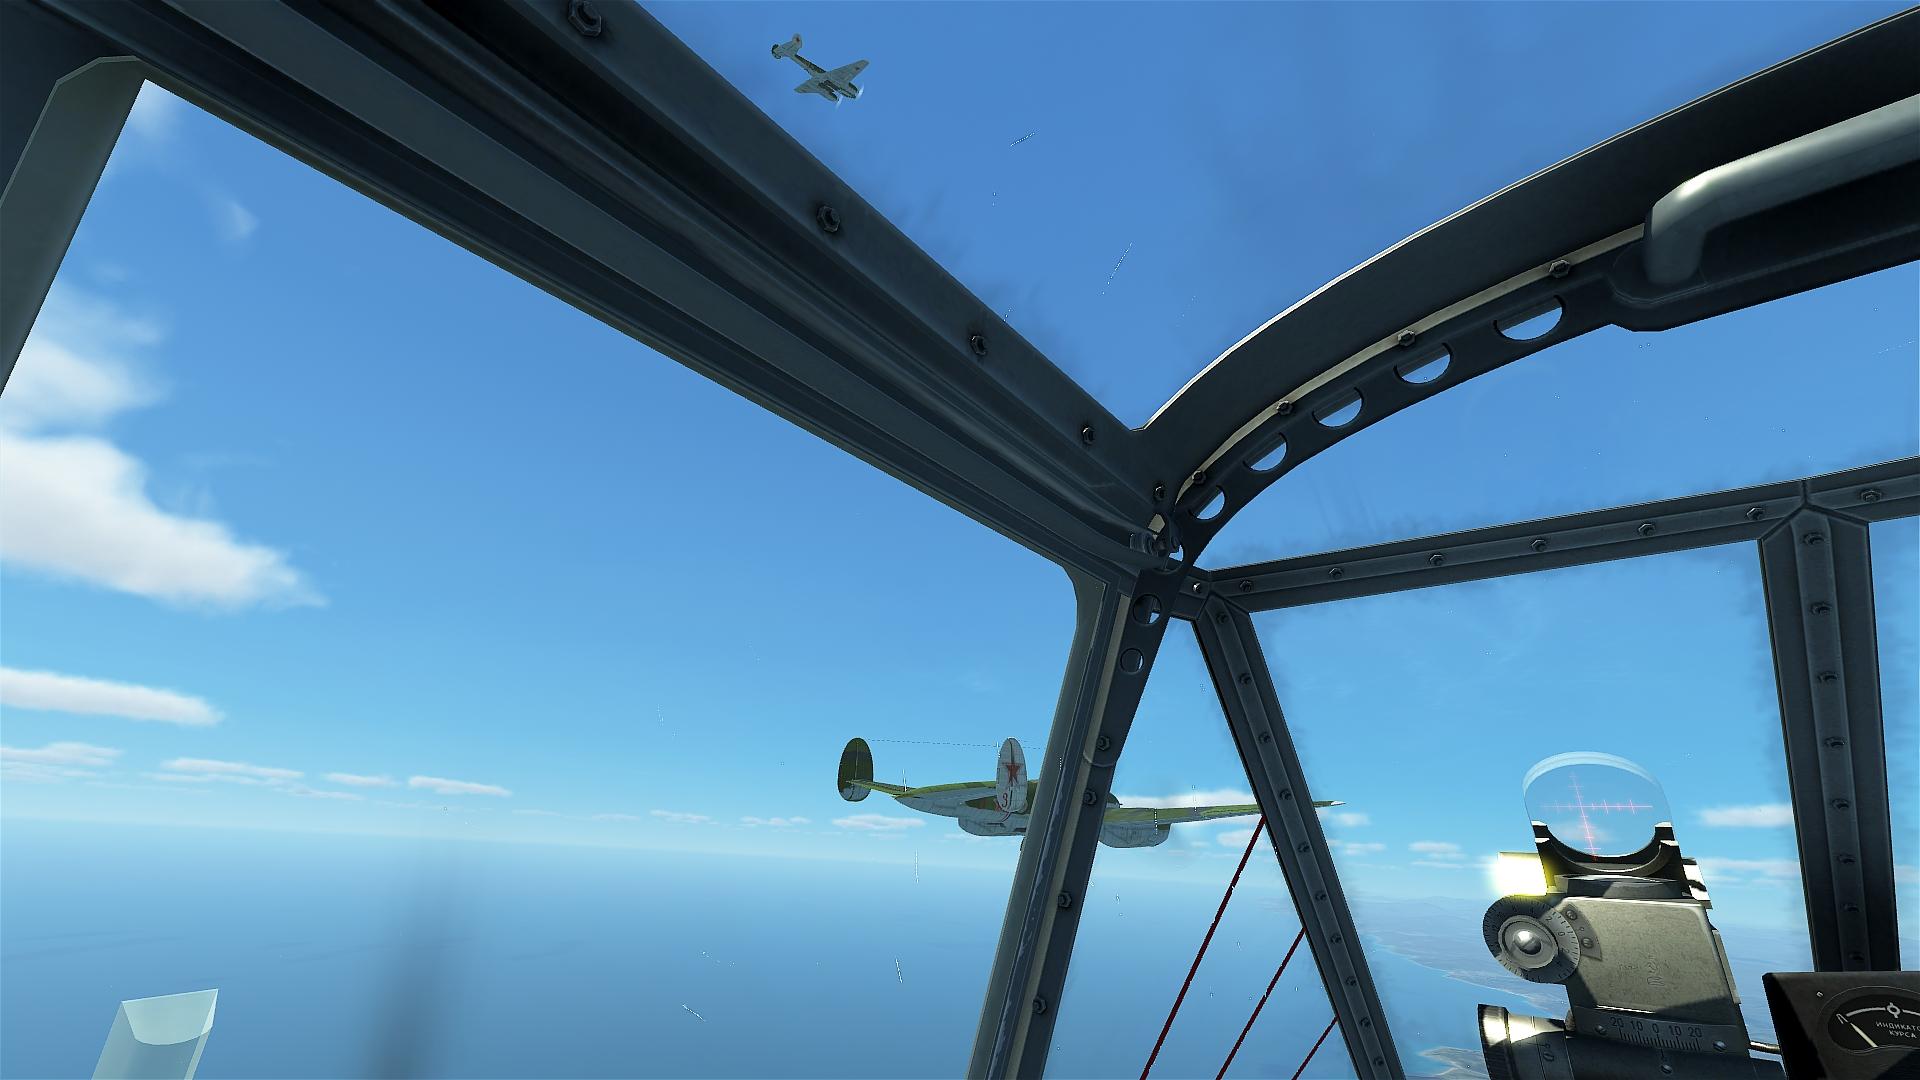 Un ptit CR en image de  la sortie de vendredi sur les Fnbf avec les NN en bomber ! 41600482211_2a9b178ea0_o